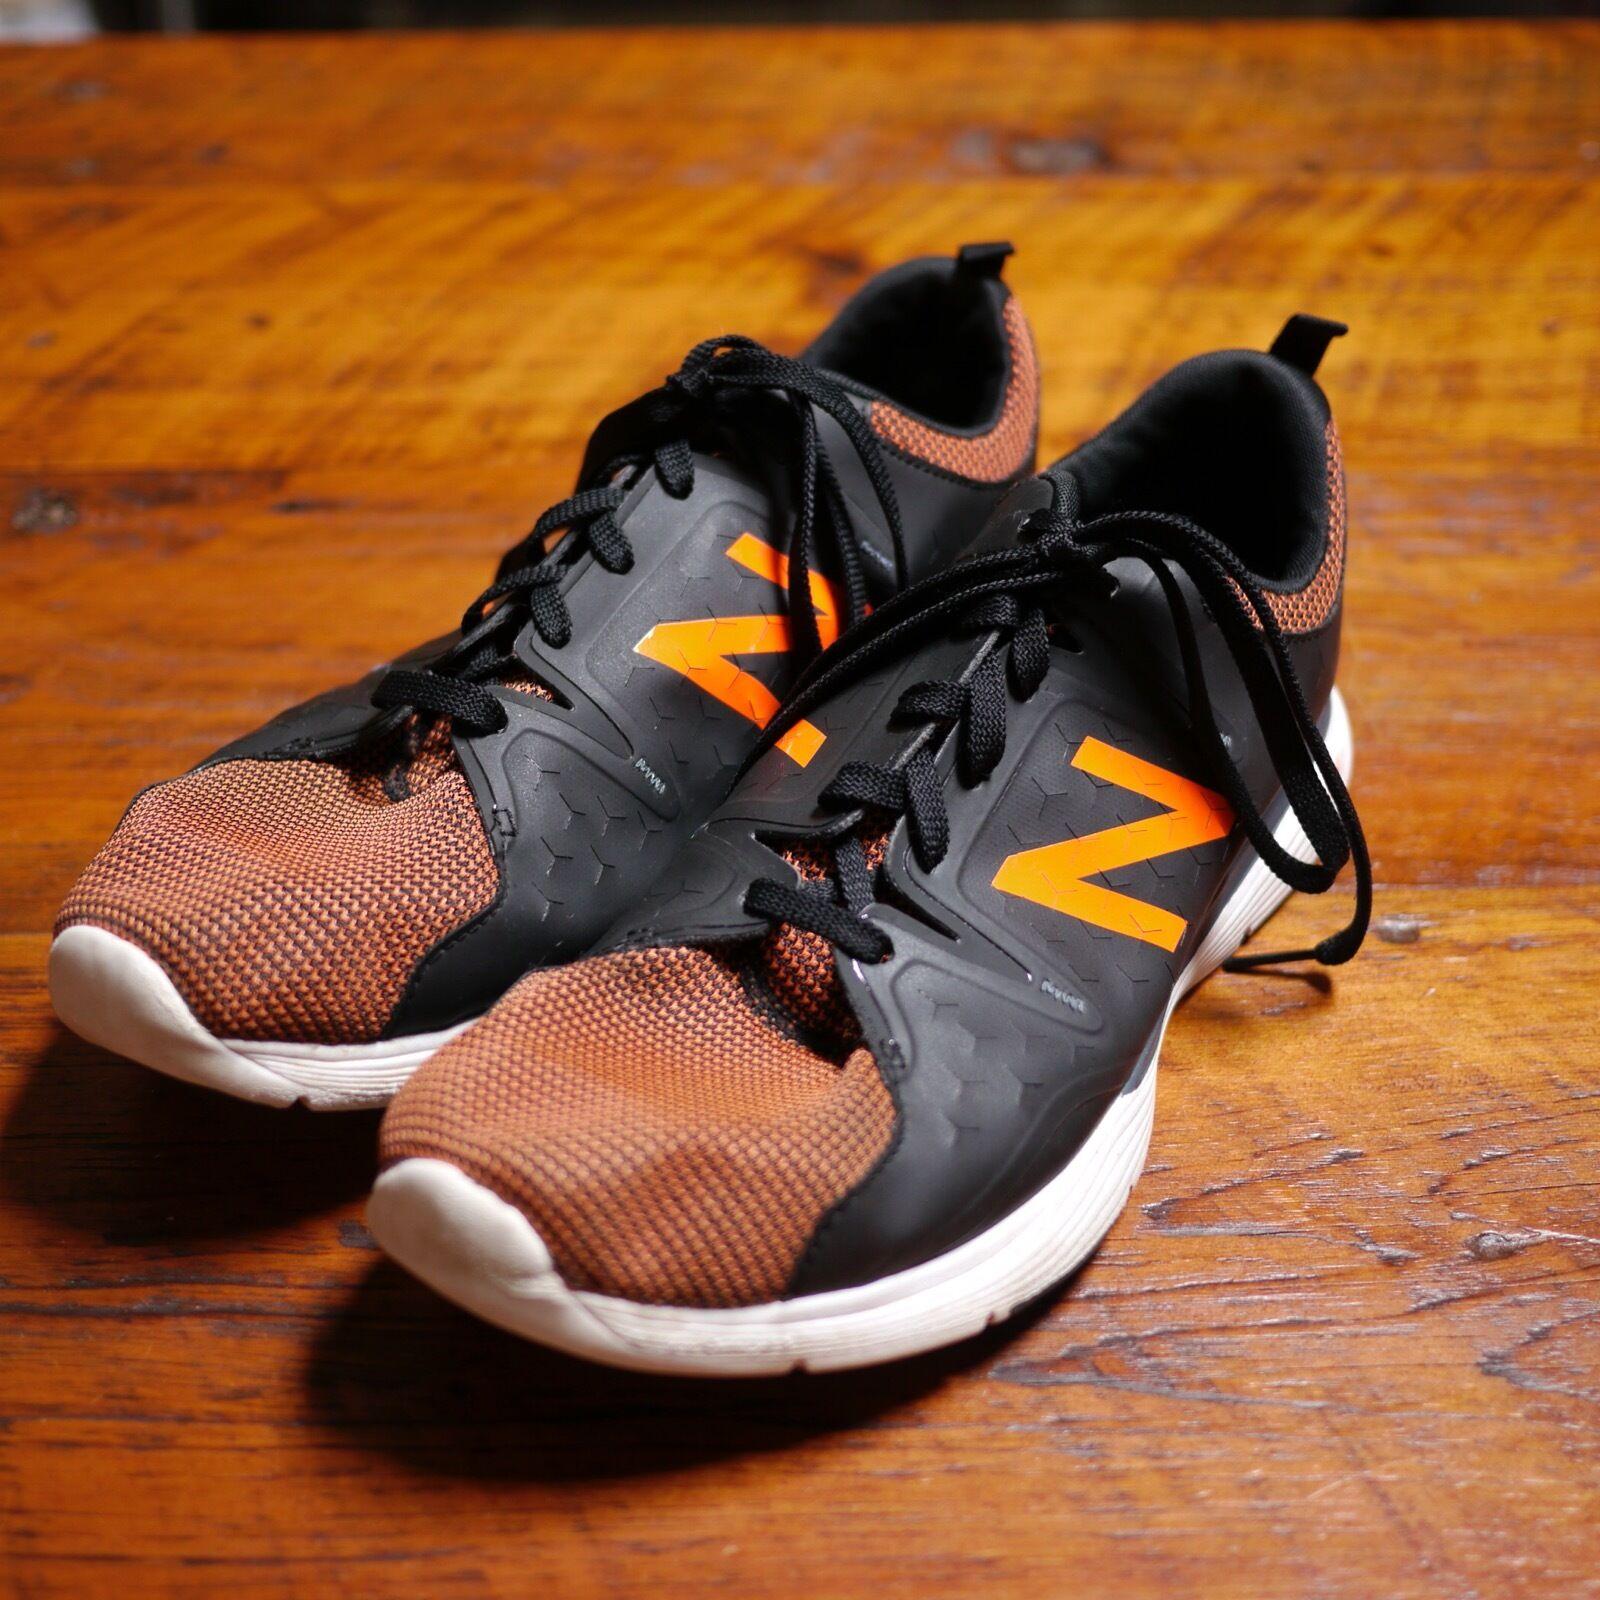 NEW BALANCE 818 Cush Black + orange Lightweight Cross-Training Sneakers 12 46.5